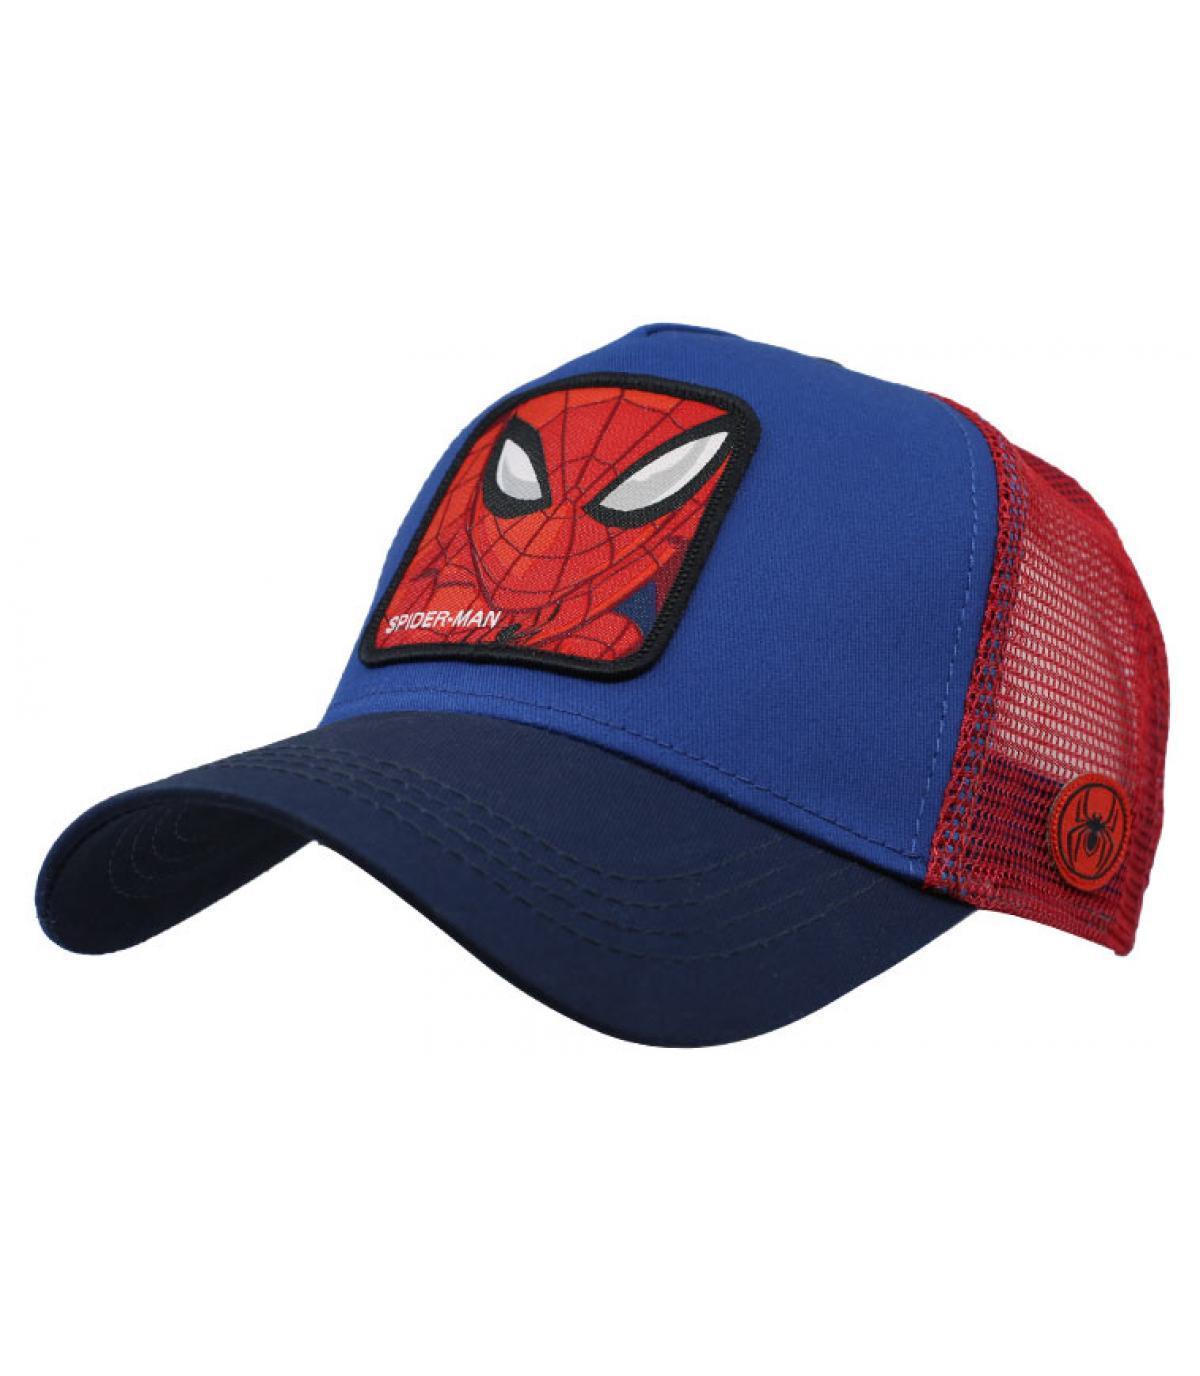 Details Trucker Spiderman - afbeeling 2